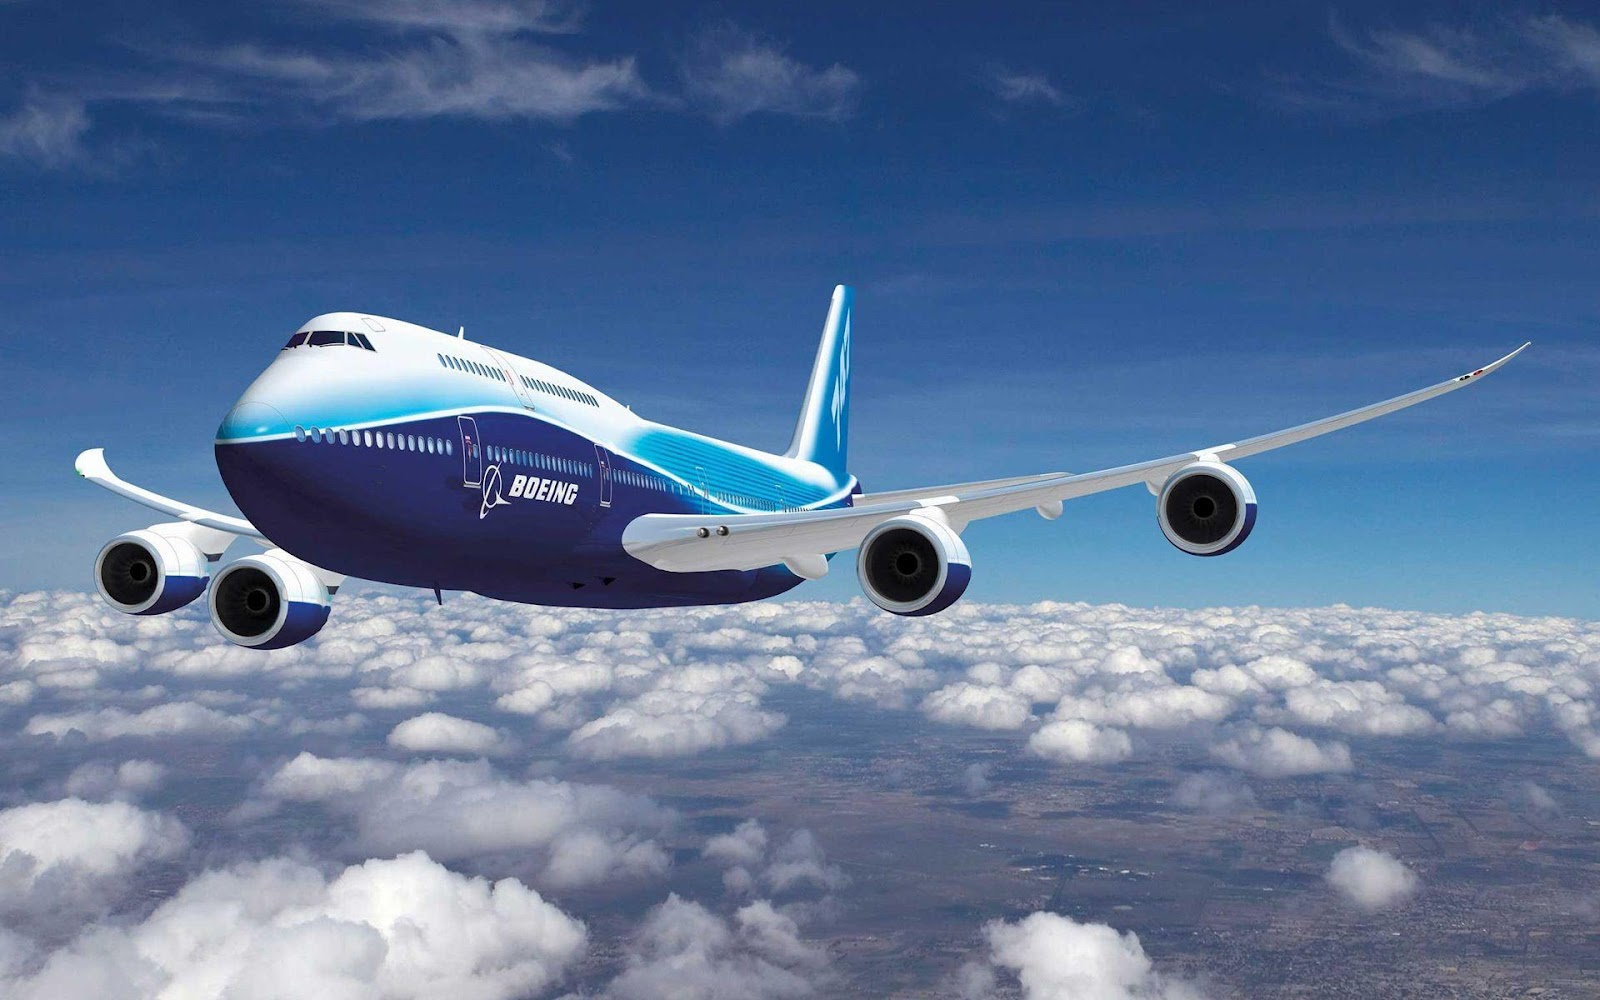 http://2.bp.blogspot.com/-lehA-SgcO60/UDpBK8TTZMI/AAAAAAAABKQ/JbknVNxHrZg/s1600/hd-vliegtuigen-wallpaper-met-een-boeing-747-hoog-in-de-lucht-hd-boeing-747-achtergrond-foto.jpg